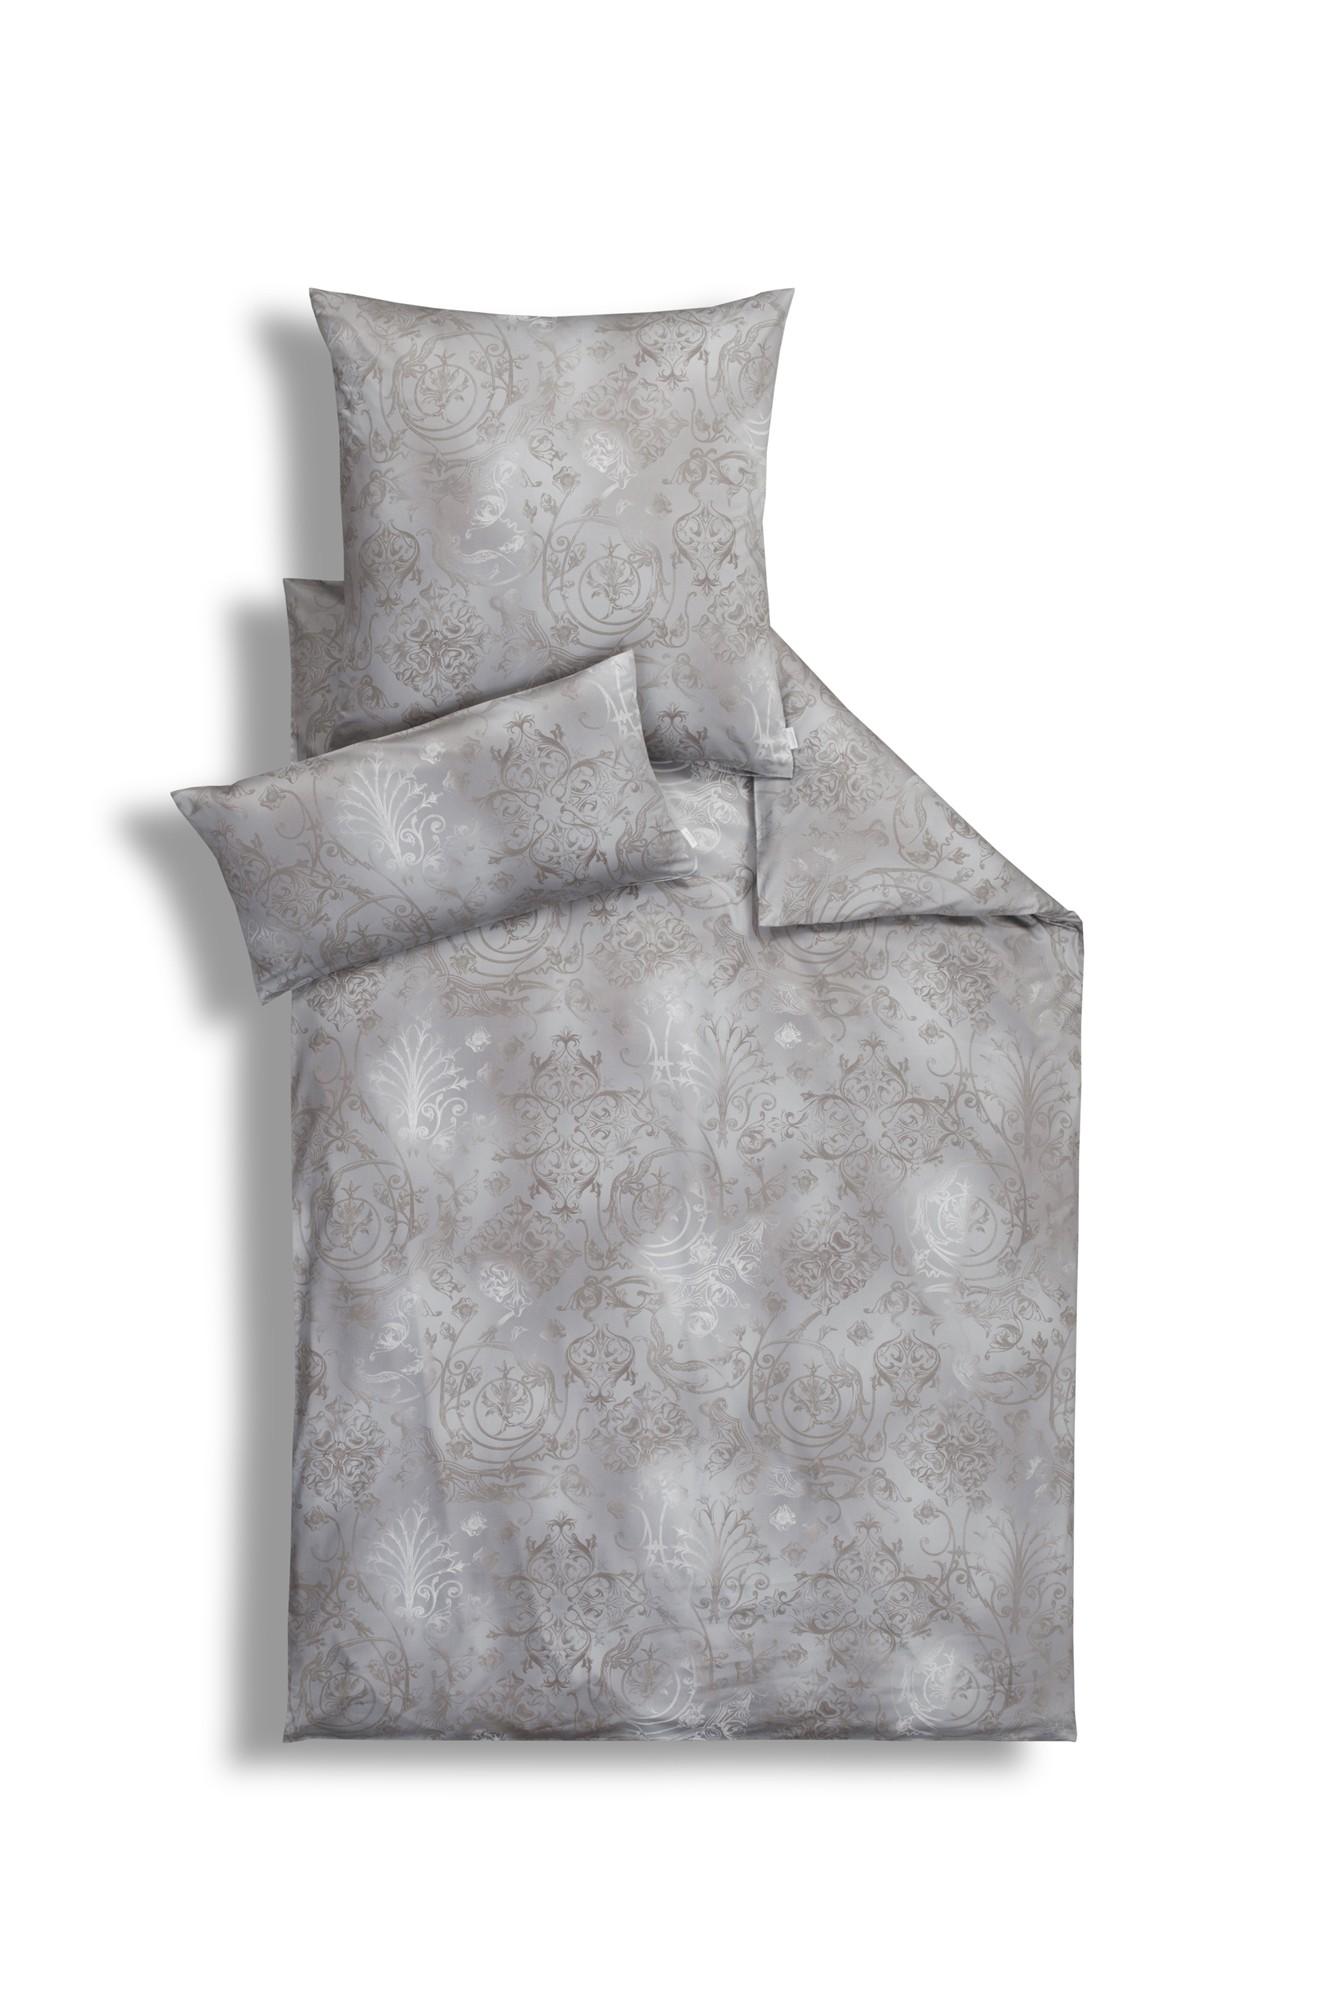 bettwsche jersey 155x220 fabulous bettwsche mako jersey on dekoration fur wohnzimmer mako. Black Bedroom Furniture Sets. Home Design Ideas